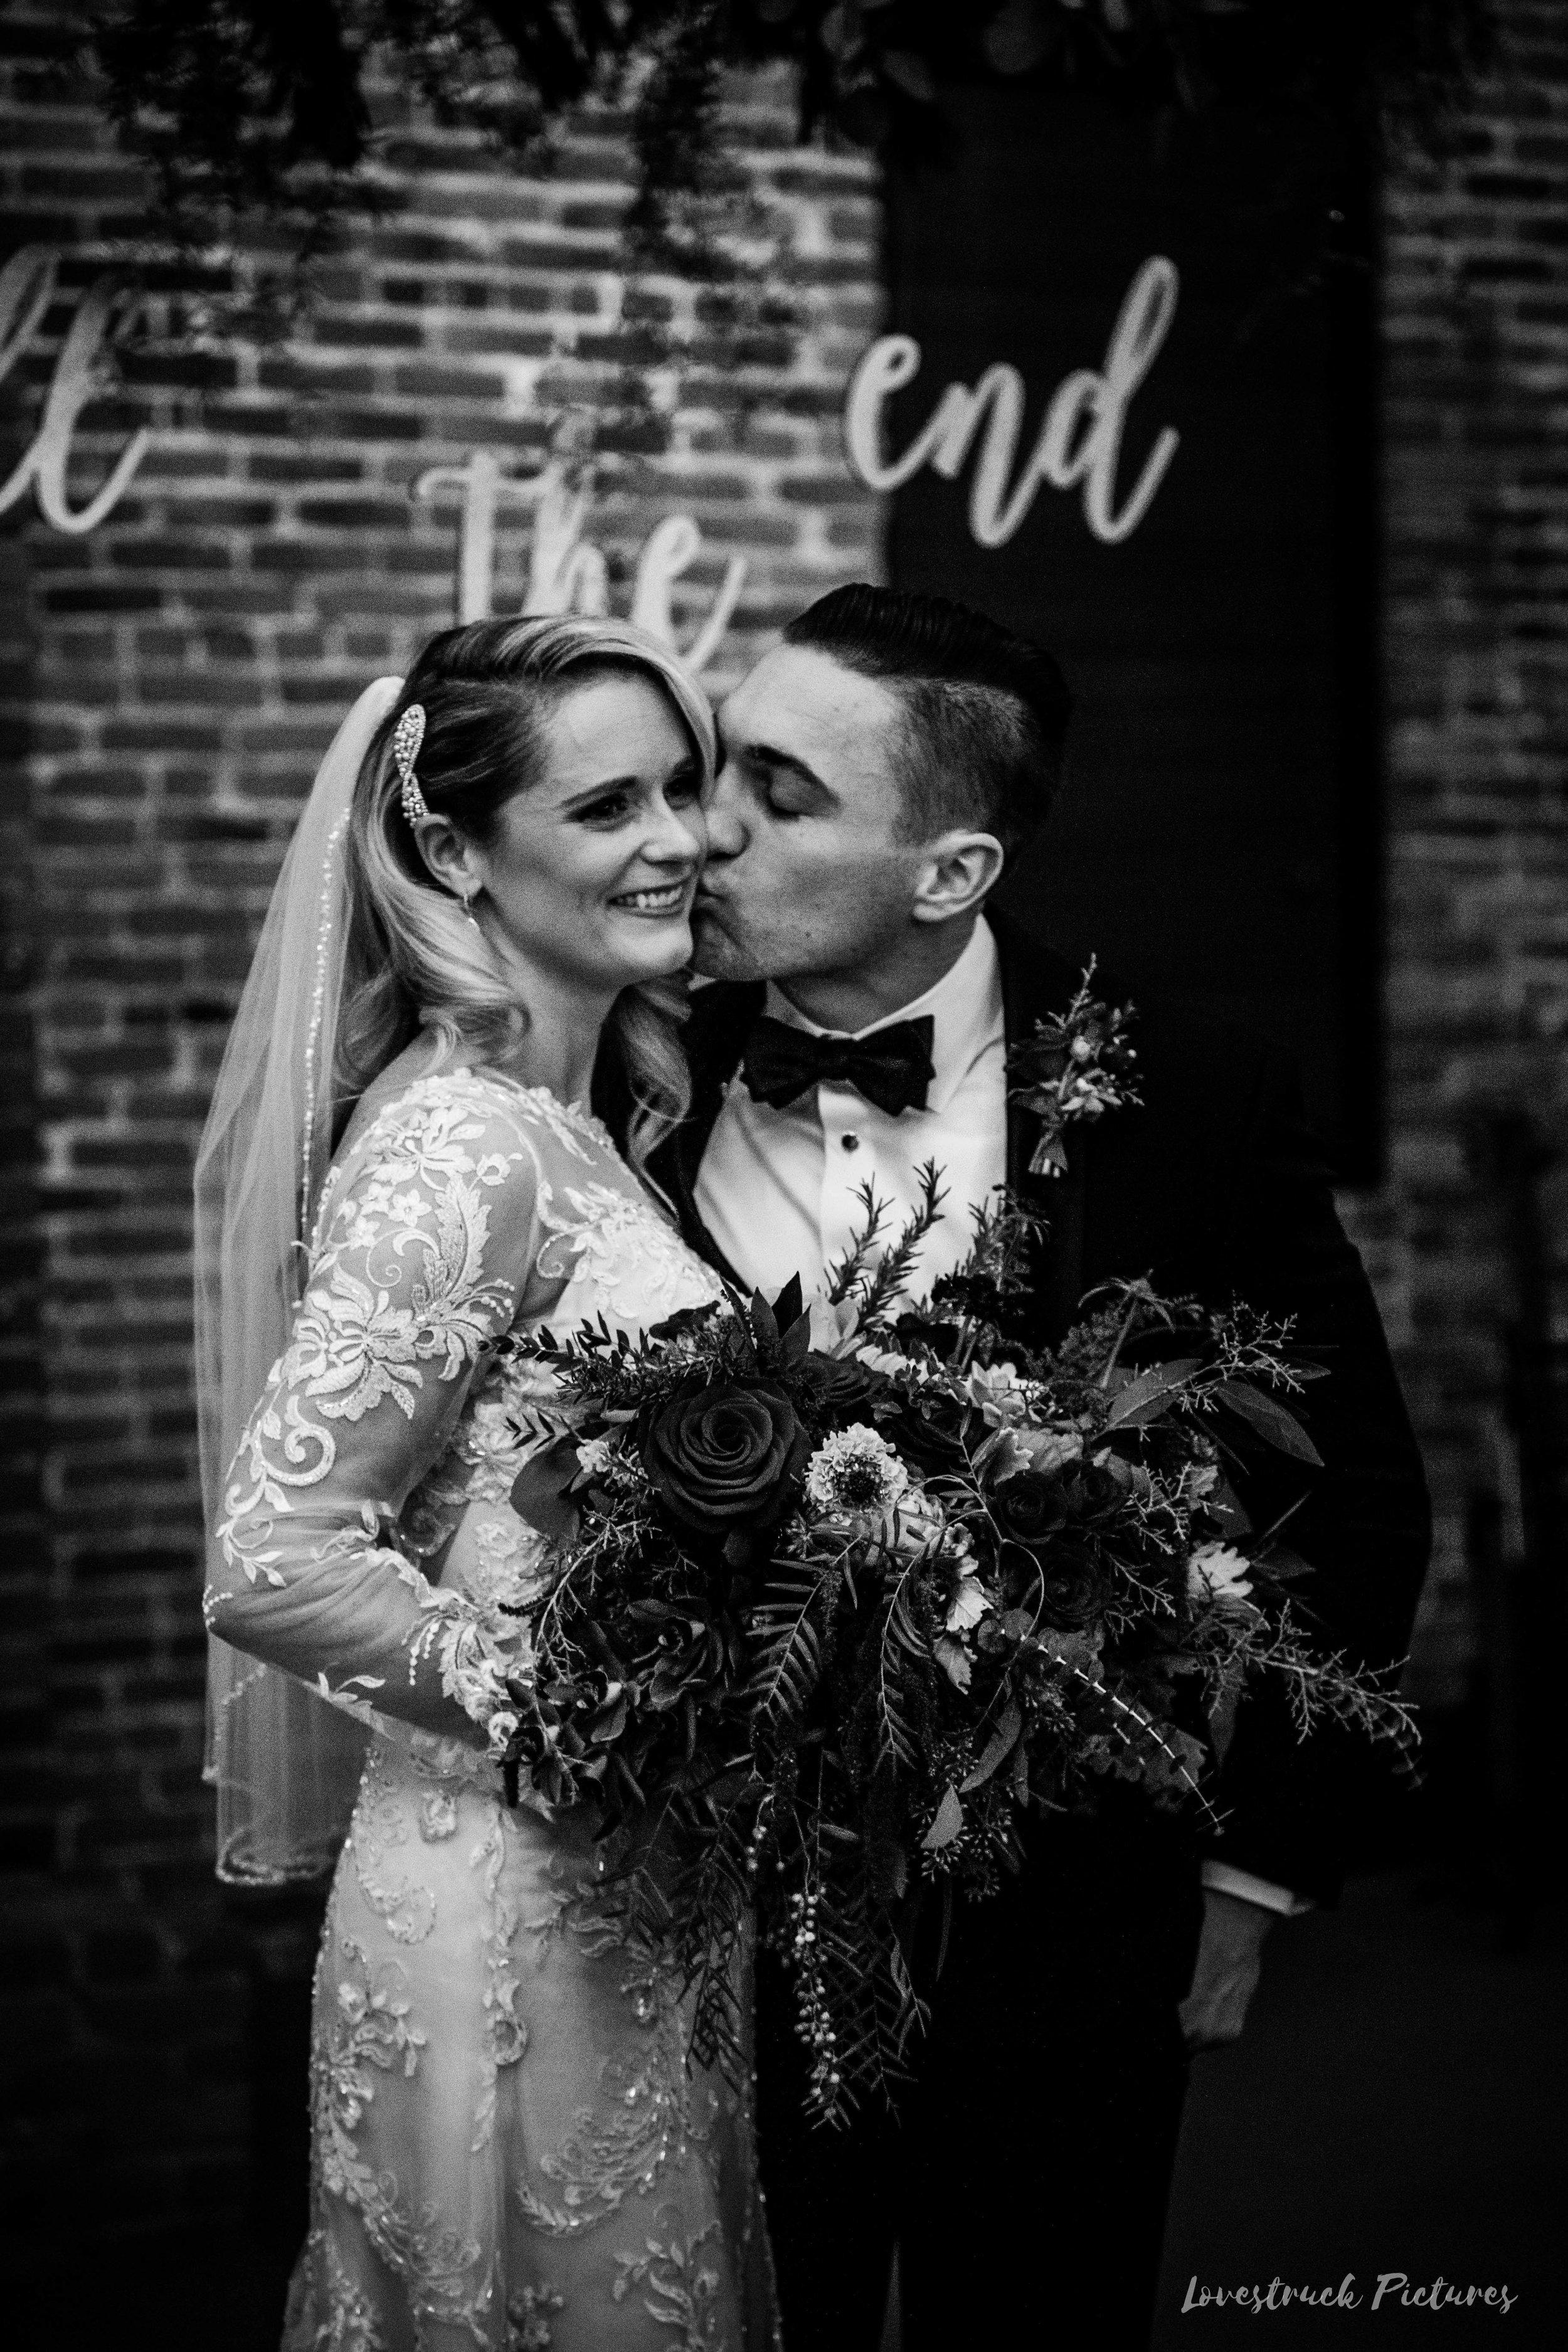 CORK_FACTORY_WEDDING_LANCASTER--245.jpg